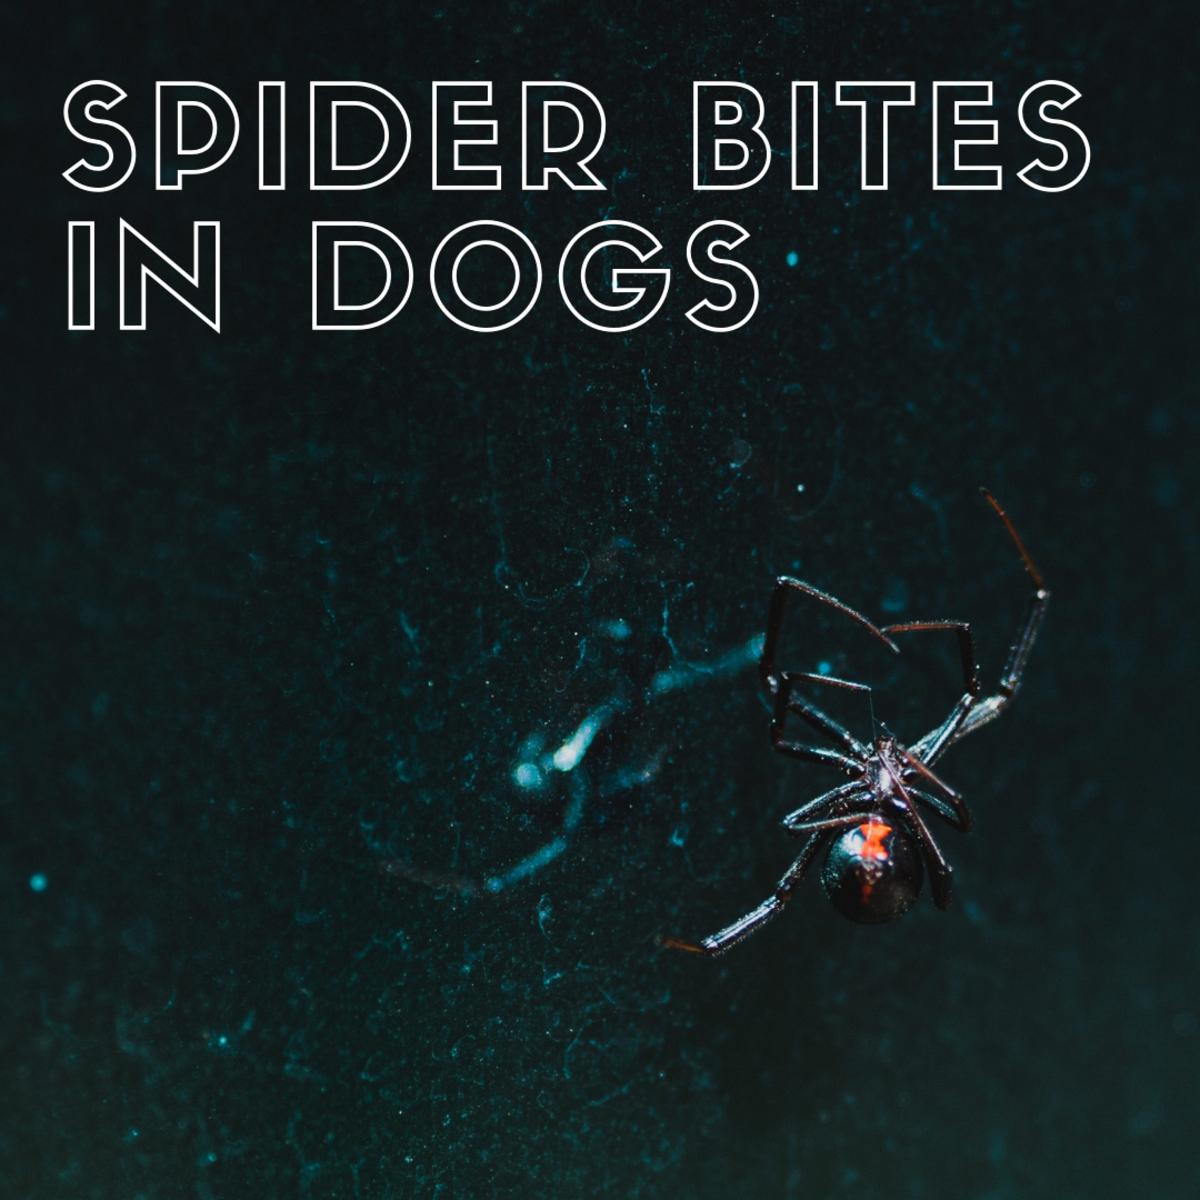 Spider bites in dogs.